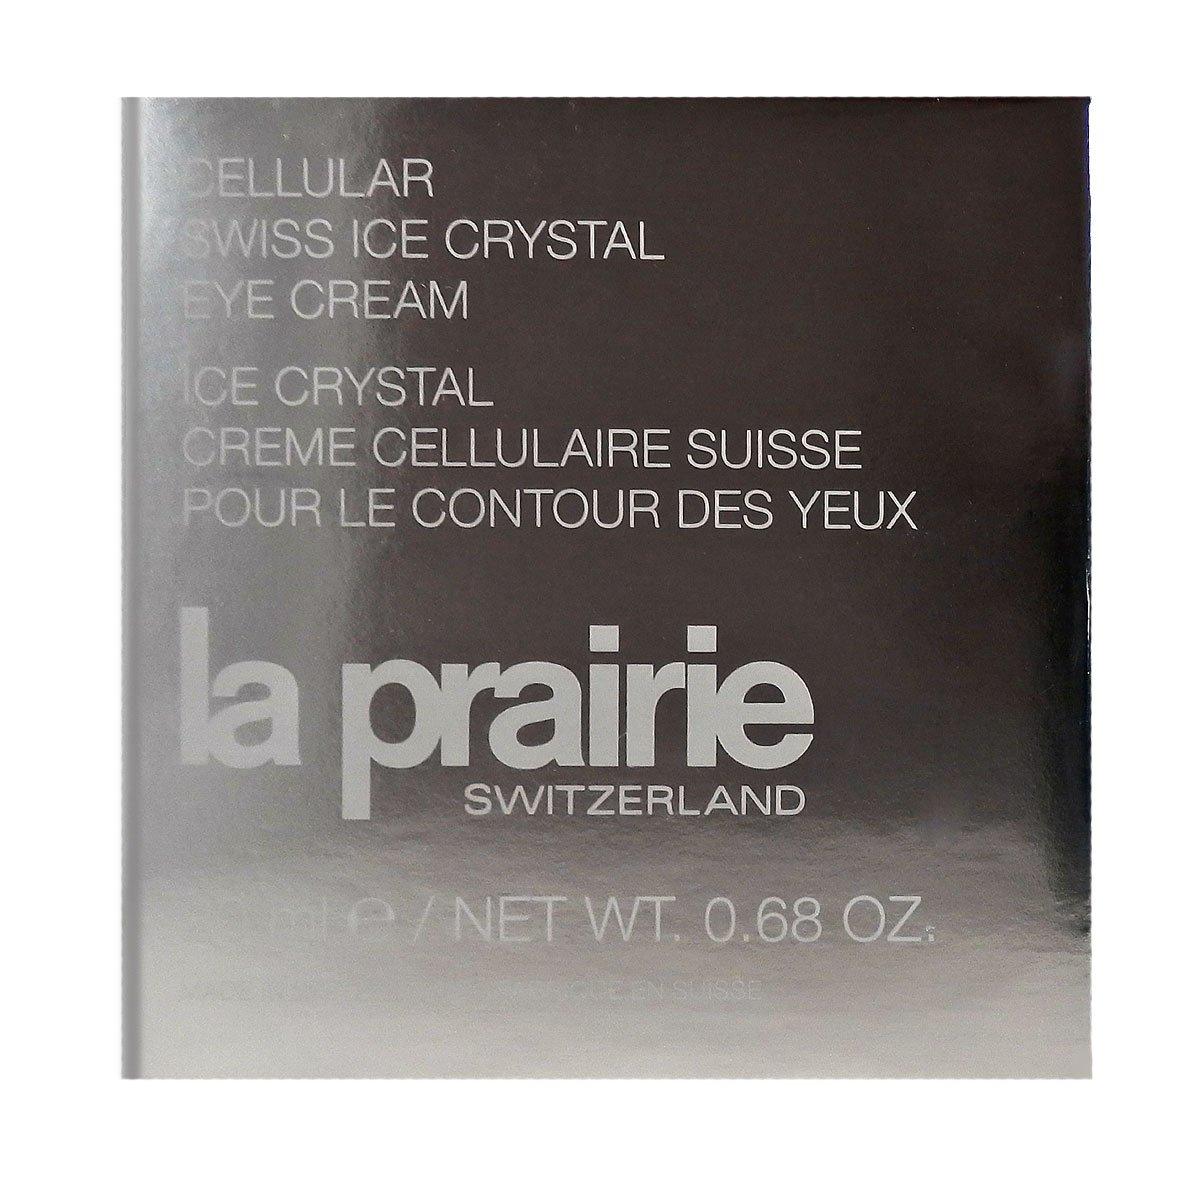 La Prairie Cellular Swiss Ice Crystal Eye Cream for Women, 0.68 Ounce